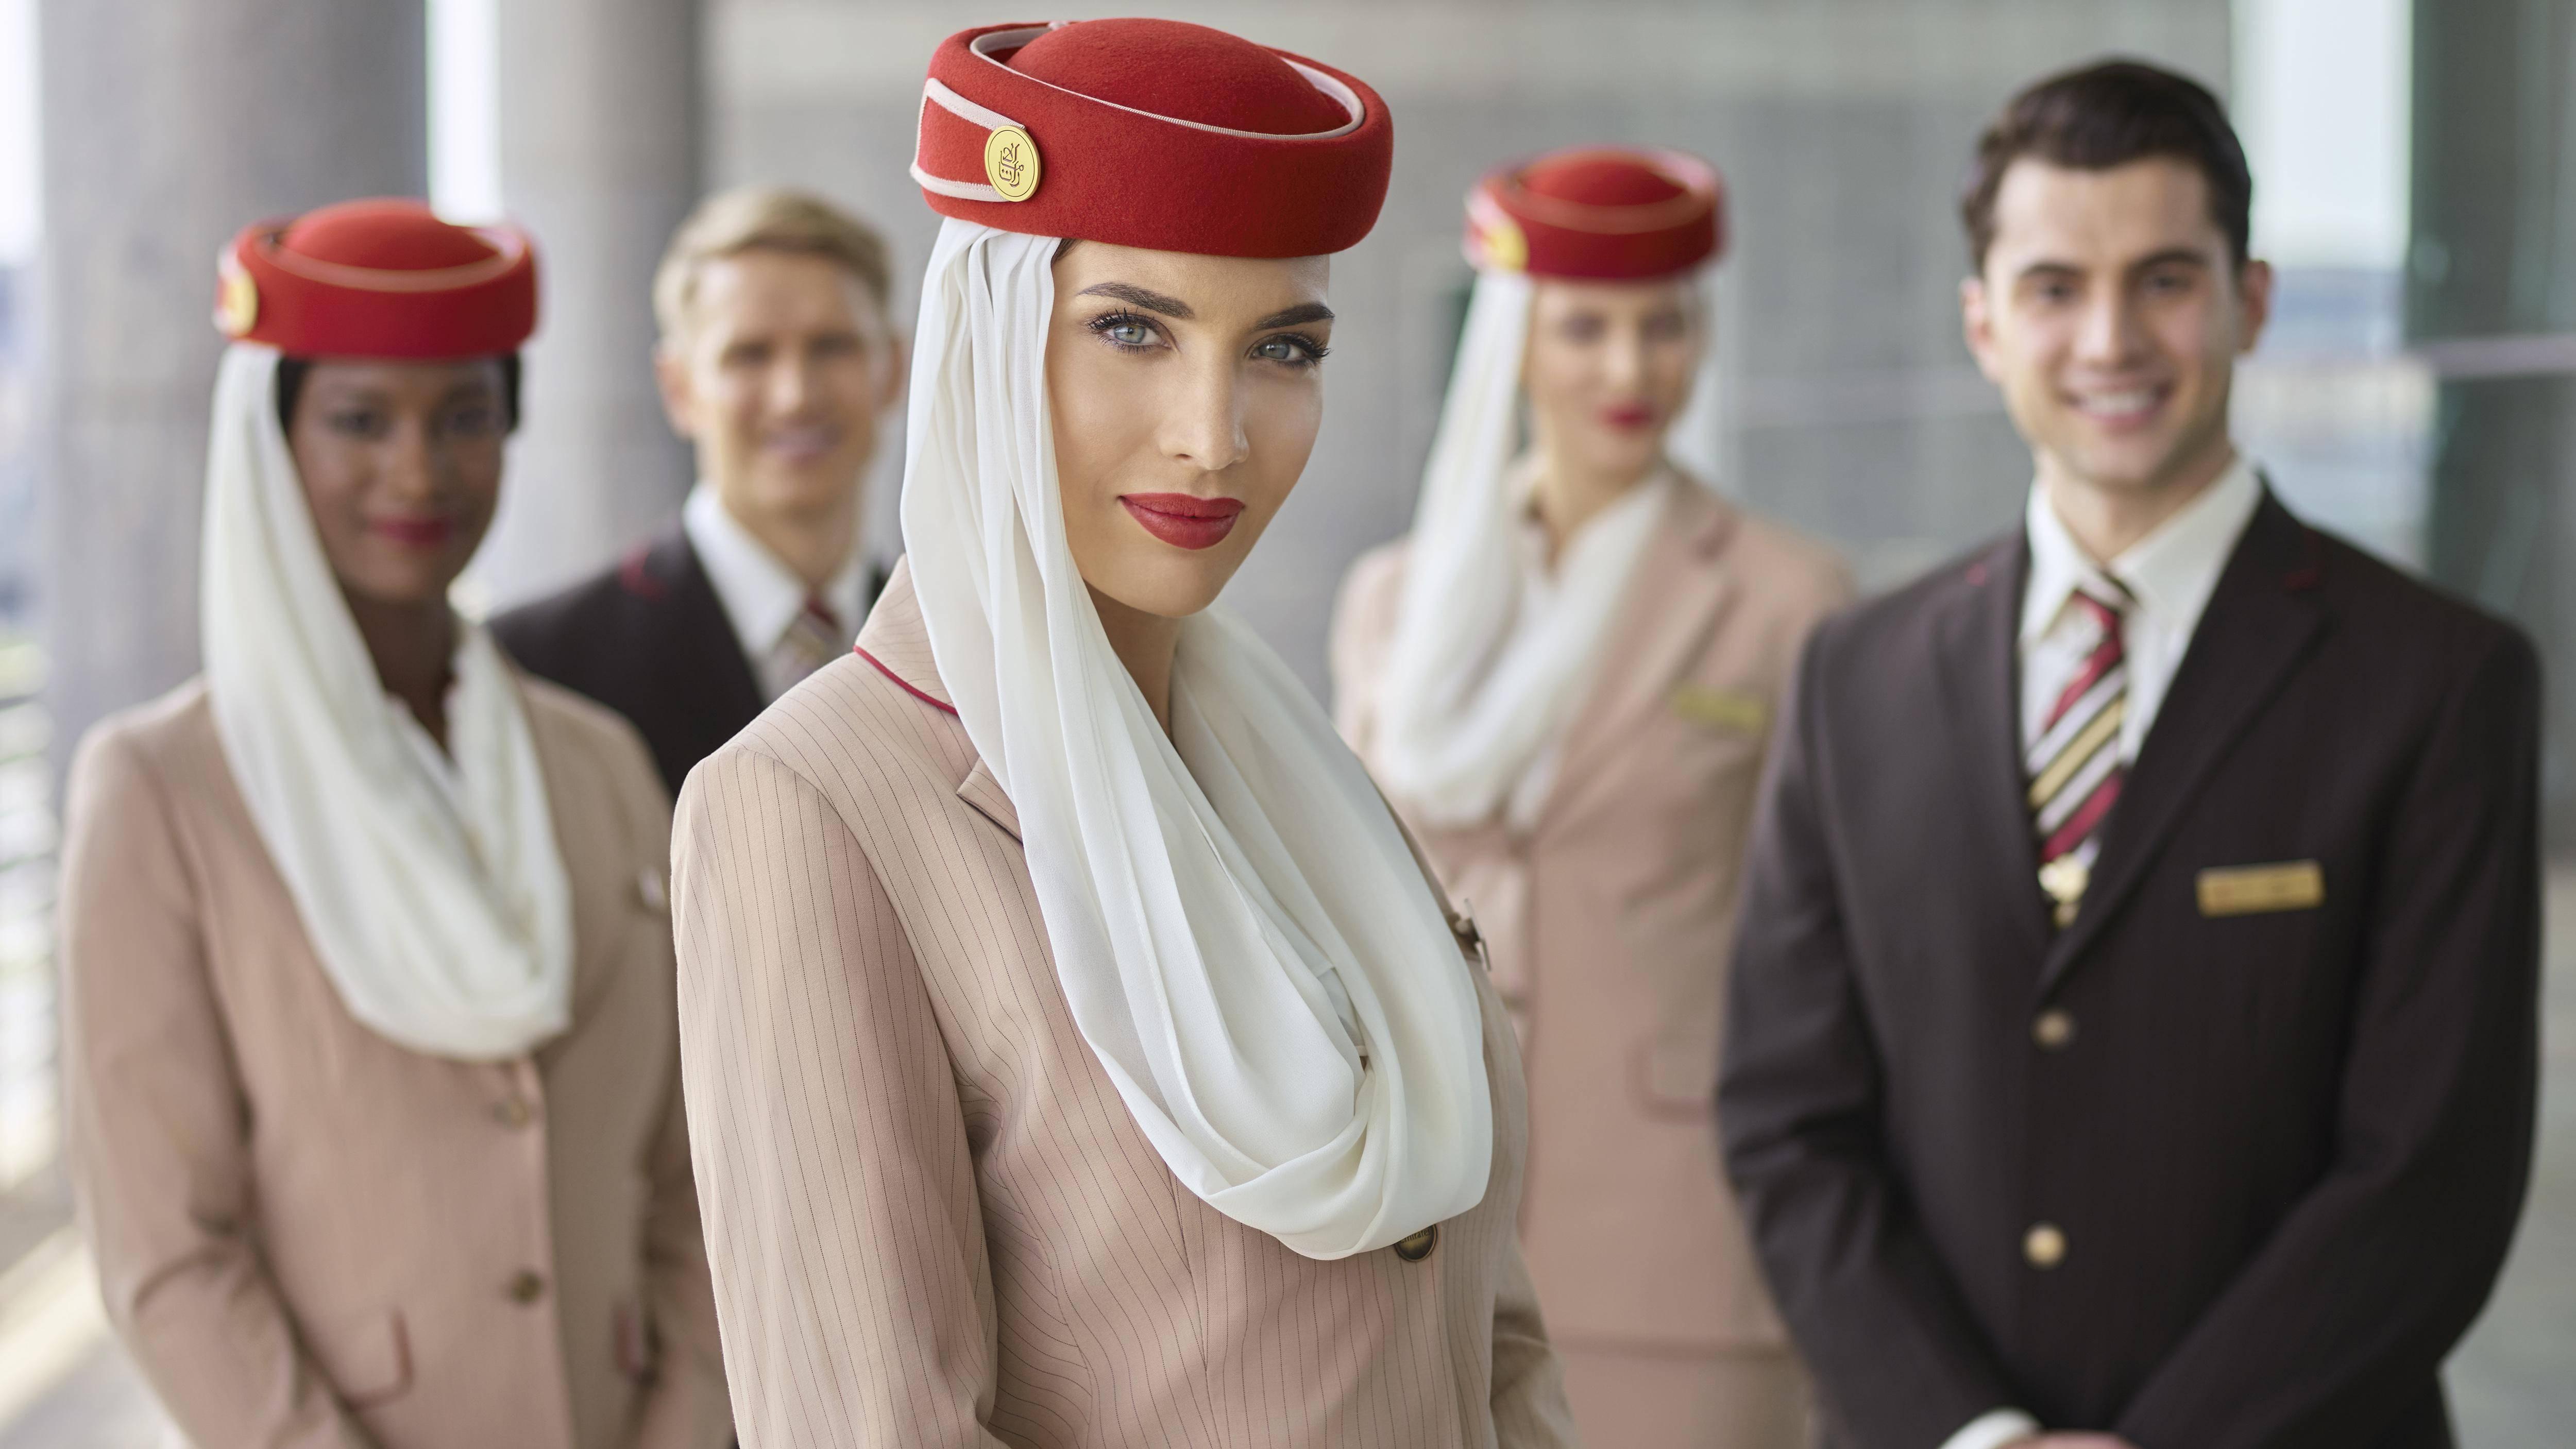 Dubai jobs: Emirates is hiring 3,000 cabin crew, 500 airport services staff